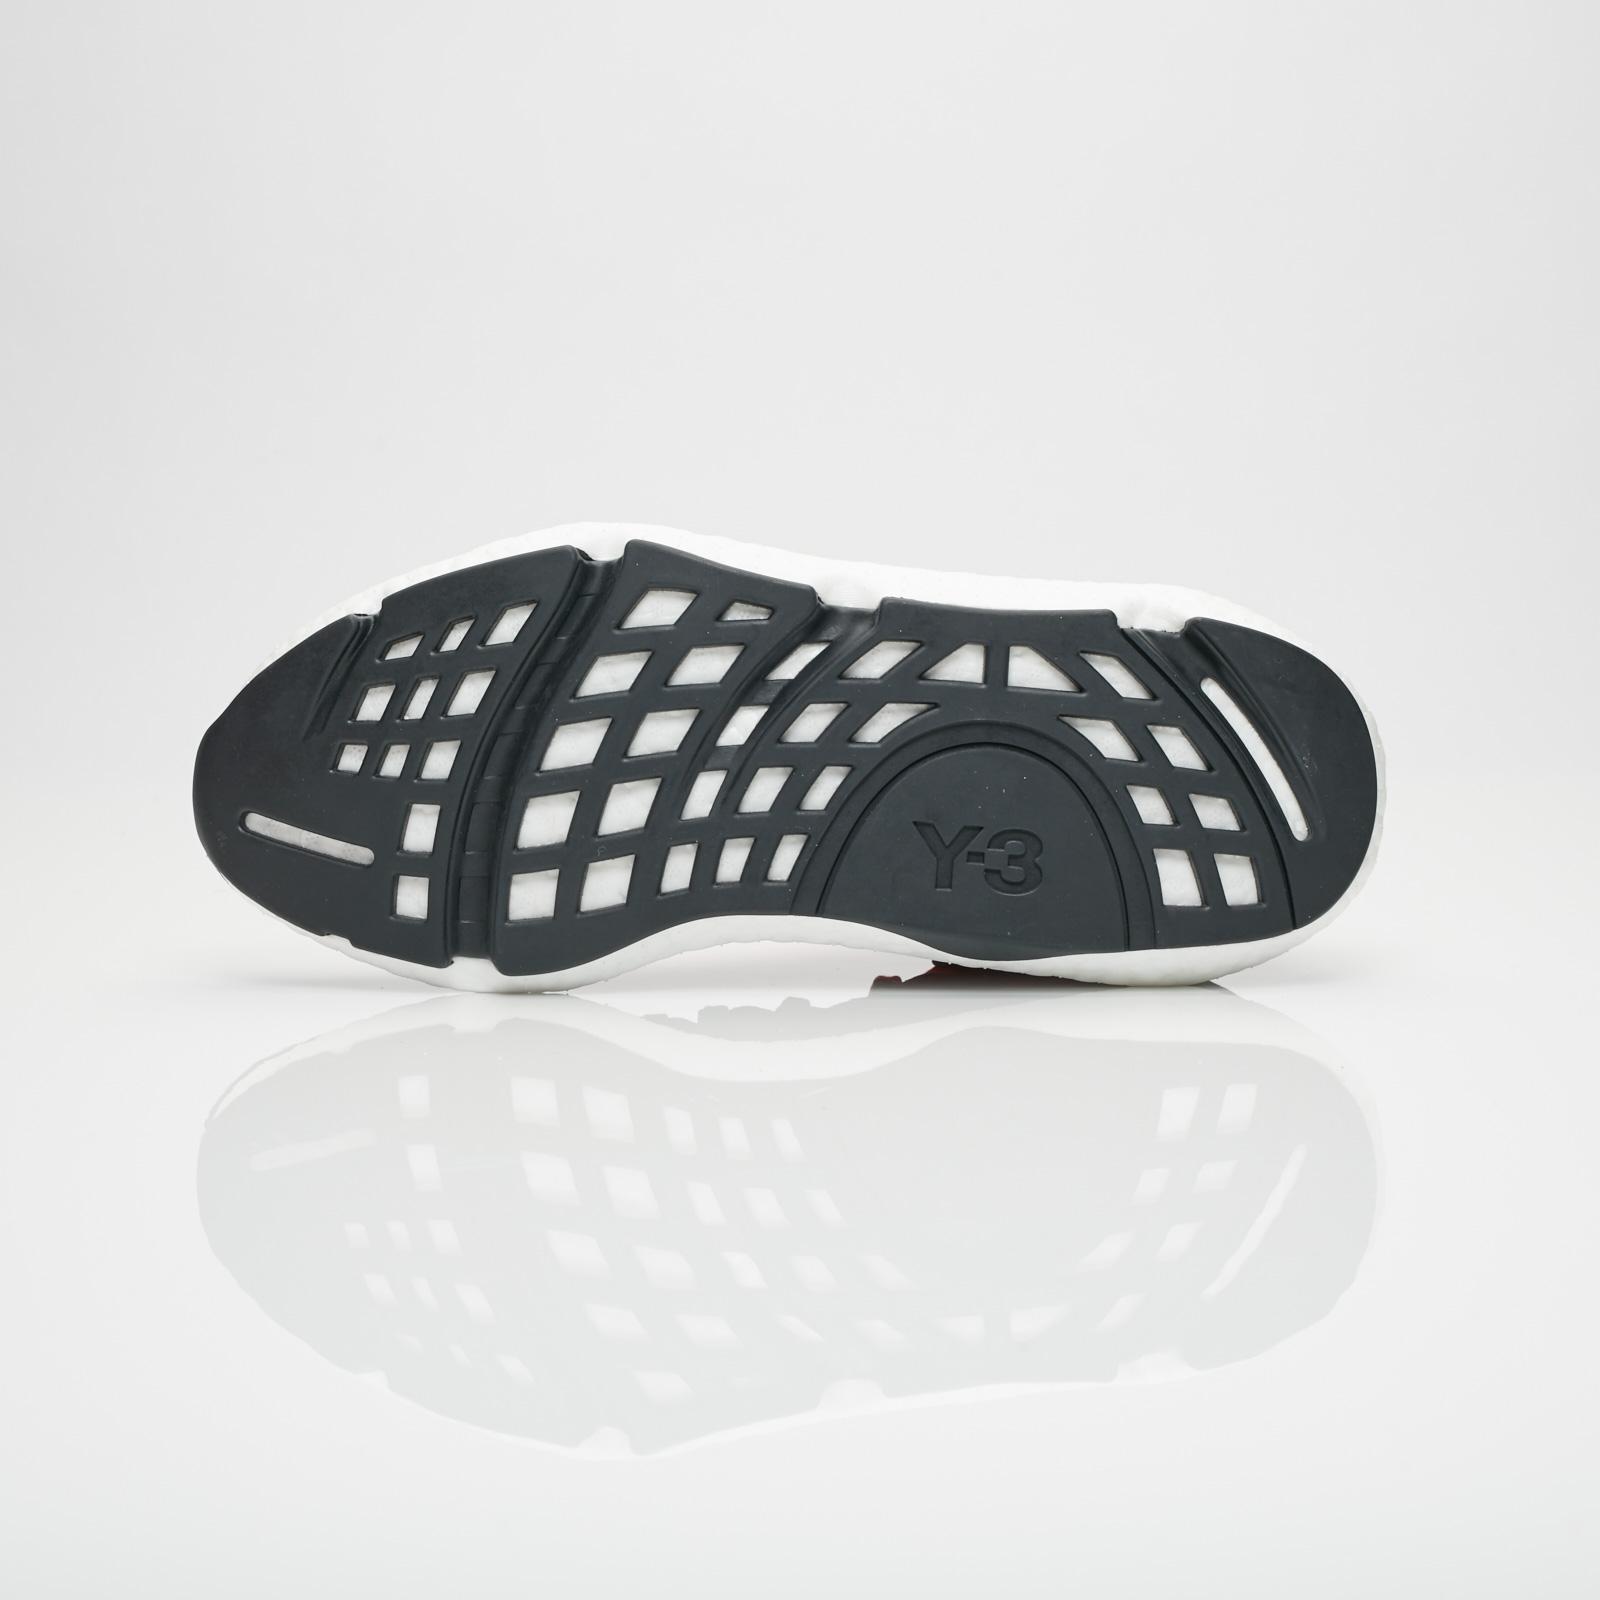 1cb2048a5 adidas Kusari - Ac7191 - Sneakersnstuff